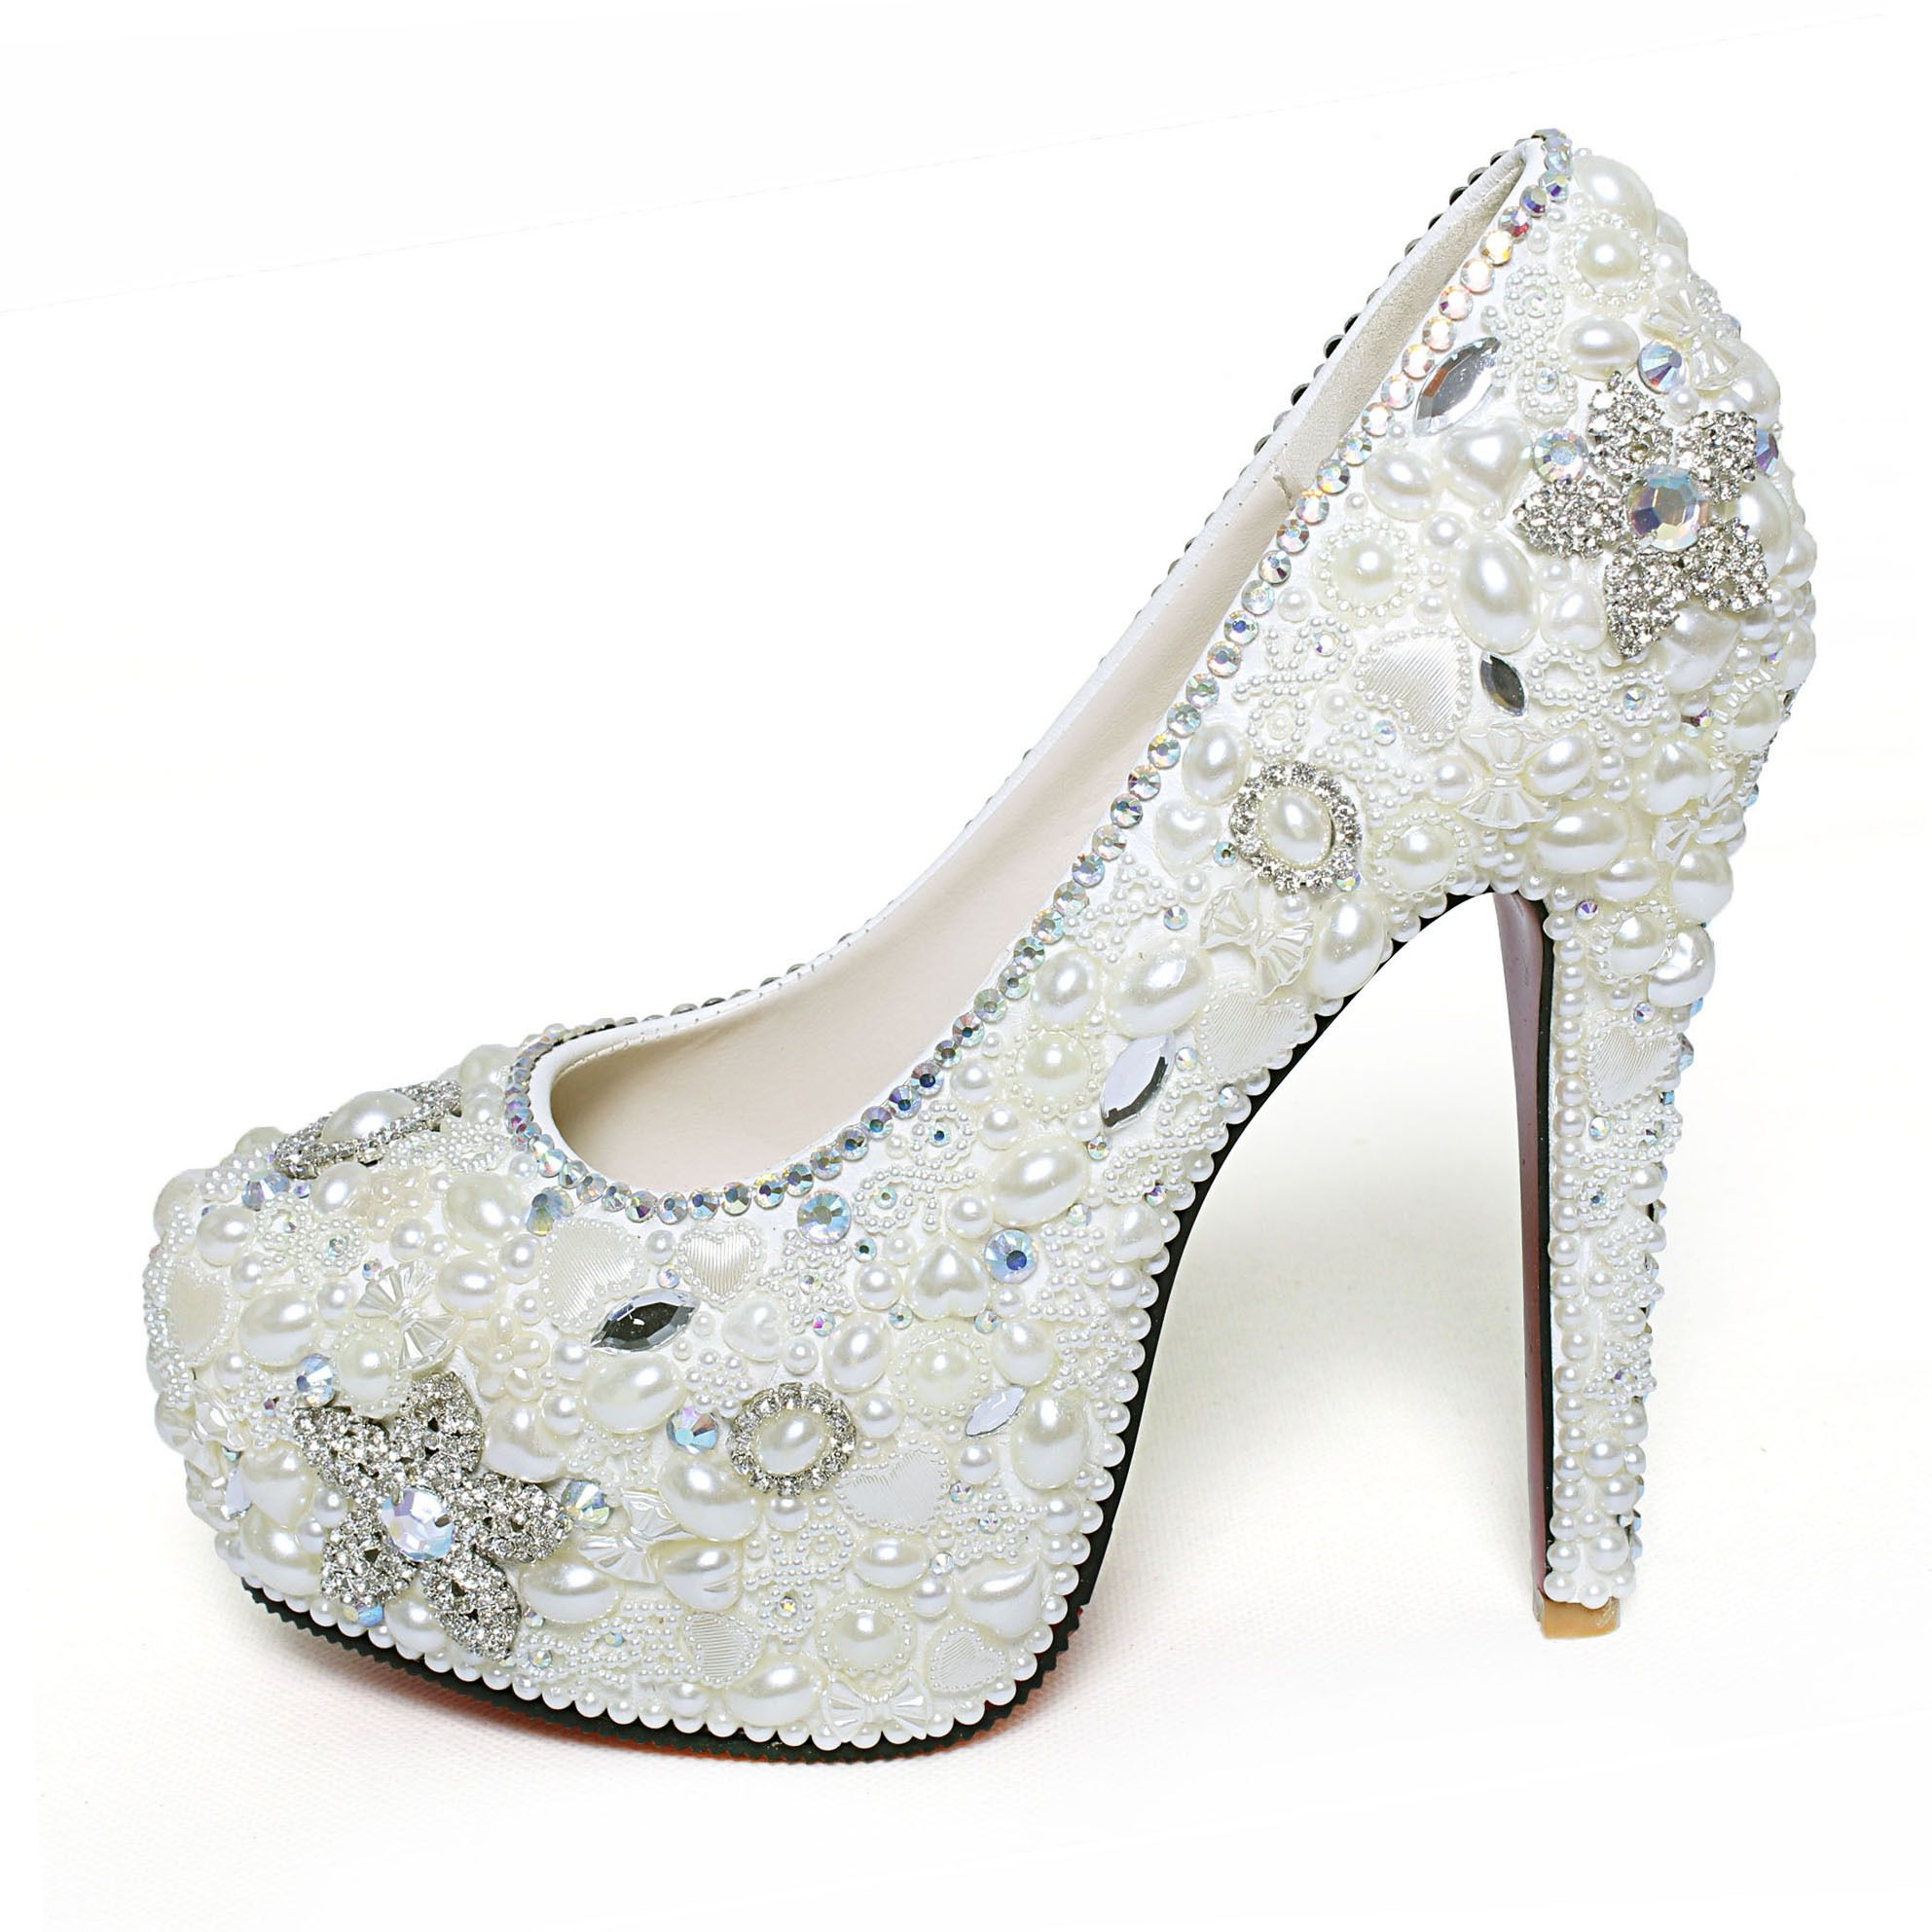 Ally Luxury Wedding Shoes Handmade High Heel Rhinestone Crystal Single White Pearl Marriage Kristin